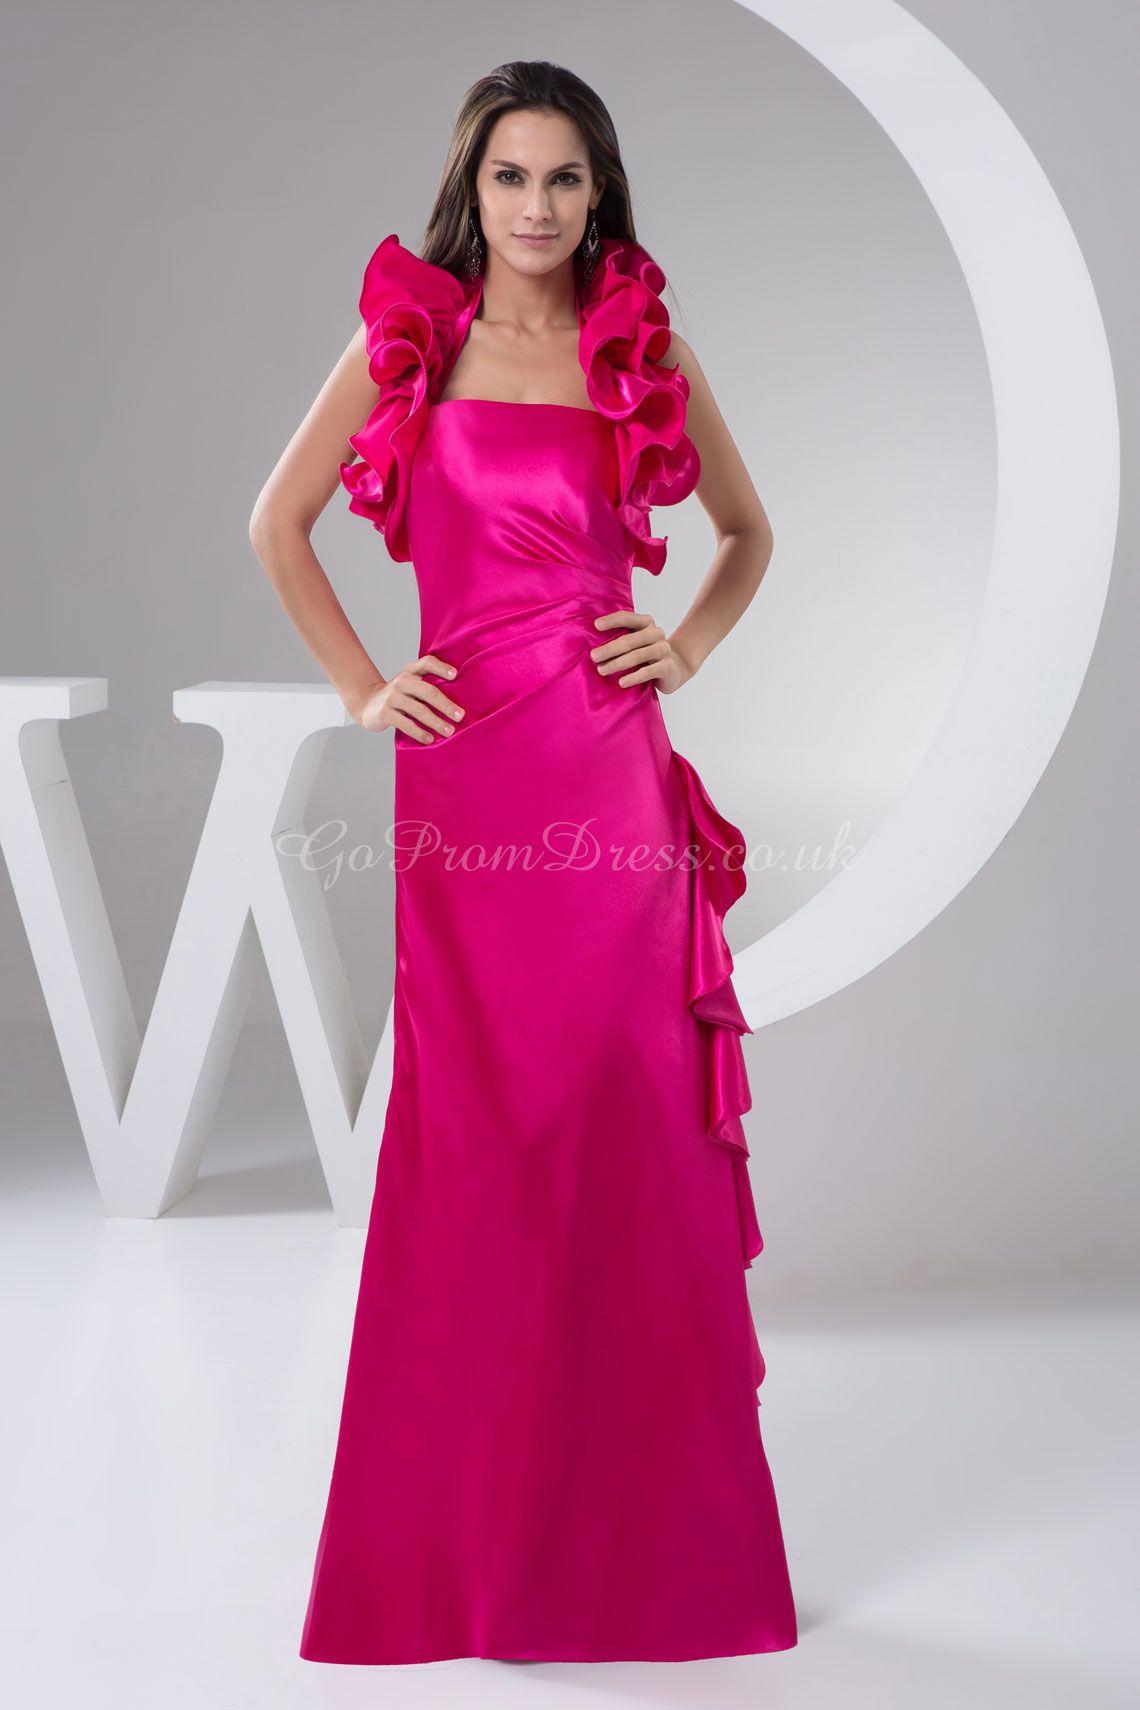 Fuchsia Prom Dresses 2013